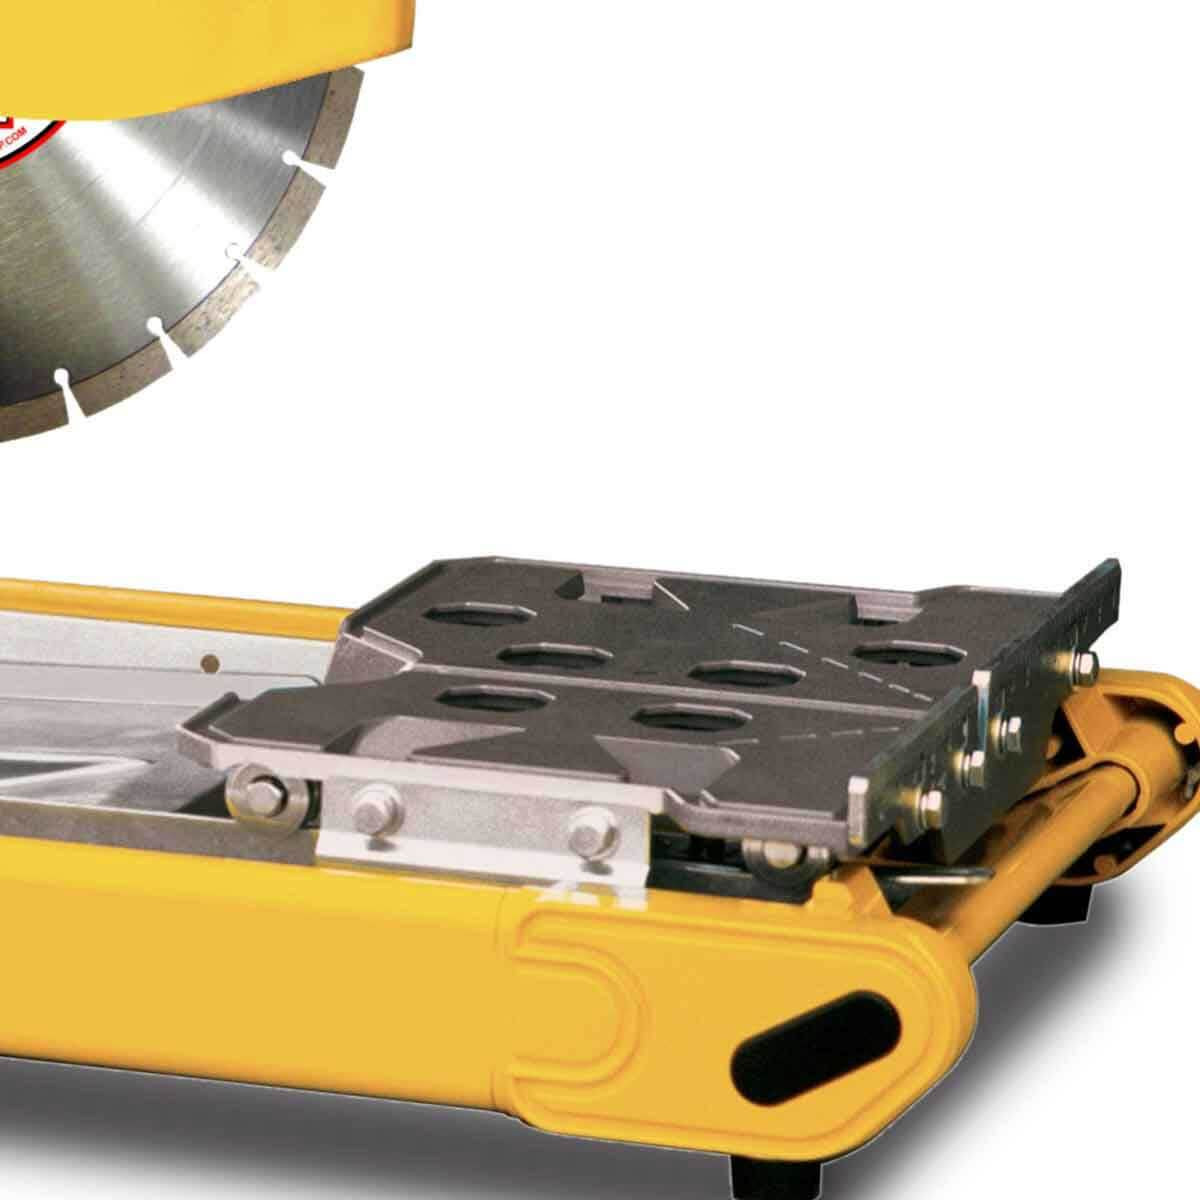 mp3 compact masonry saw tray and slide